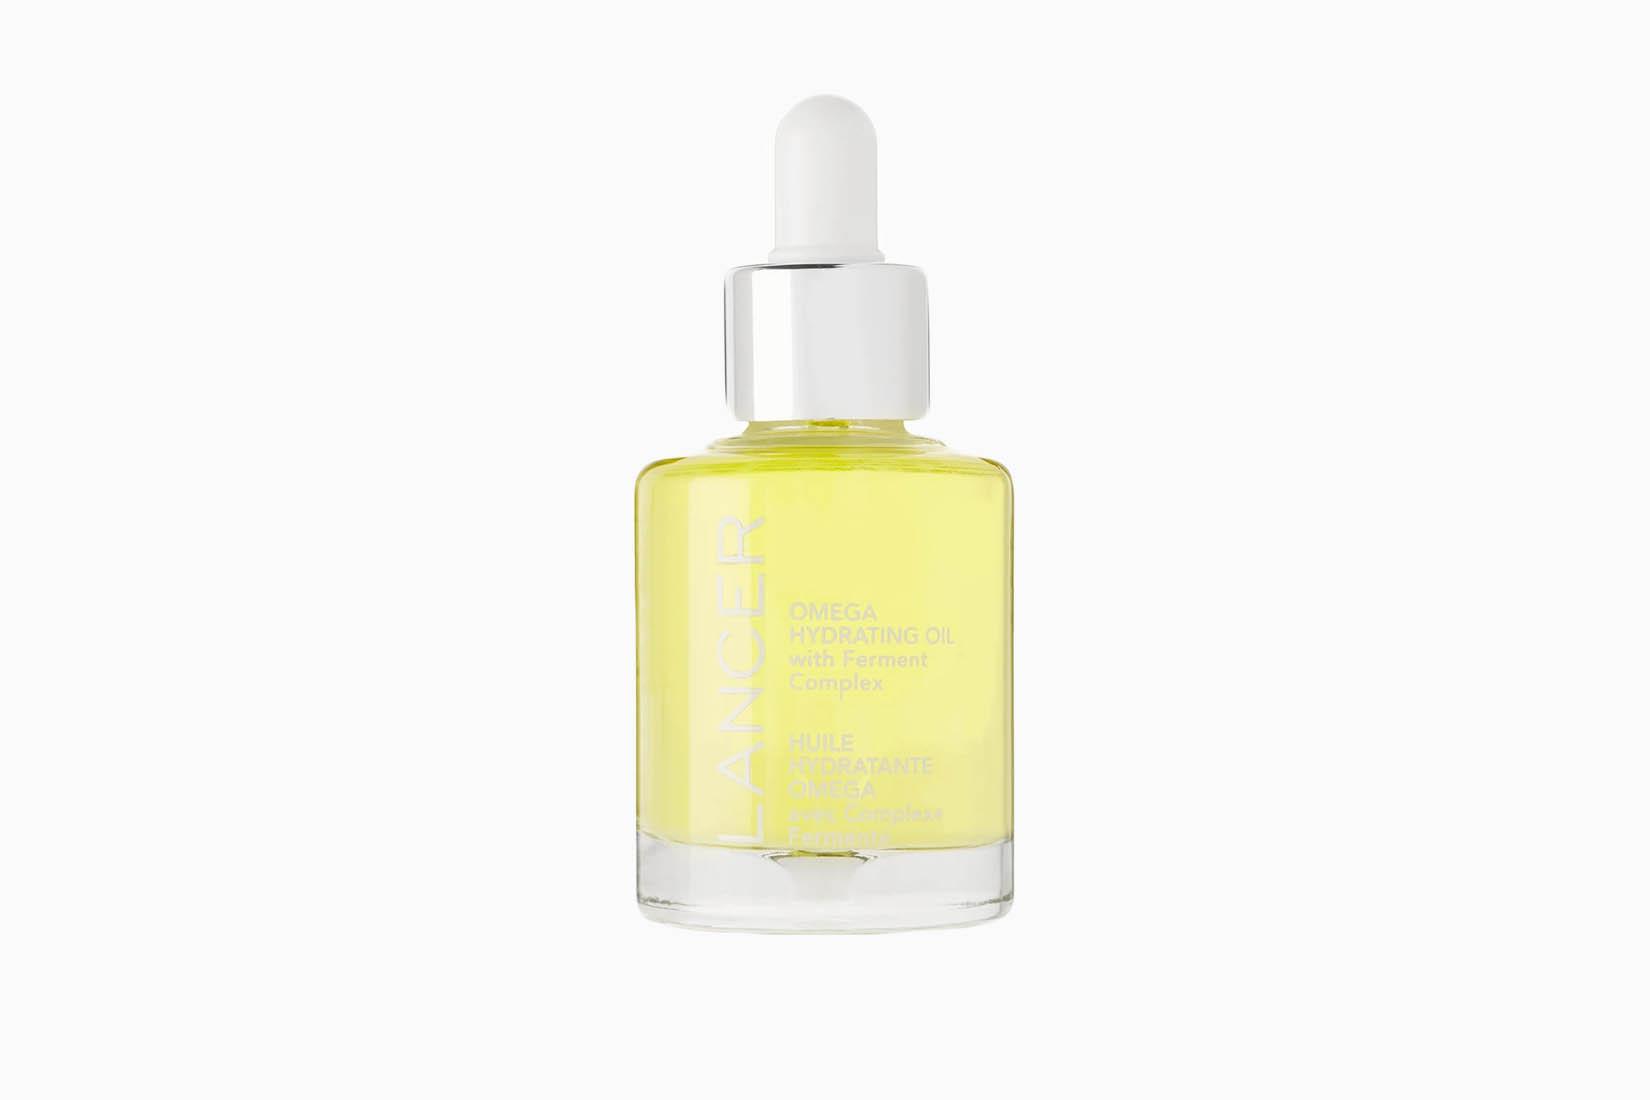 Best Face Oils Lancer Review - Luxe Digital